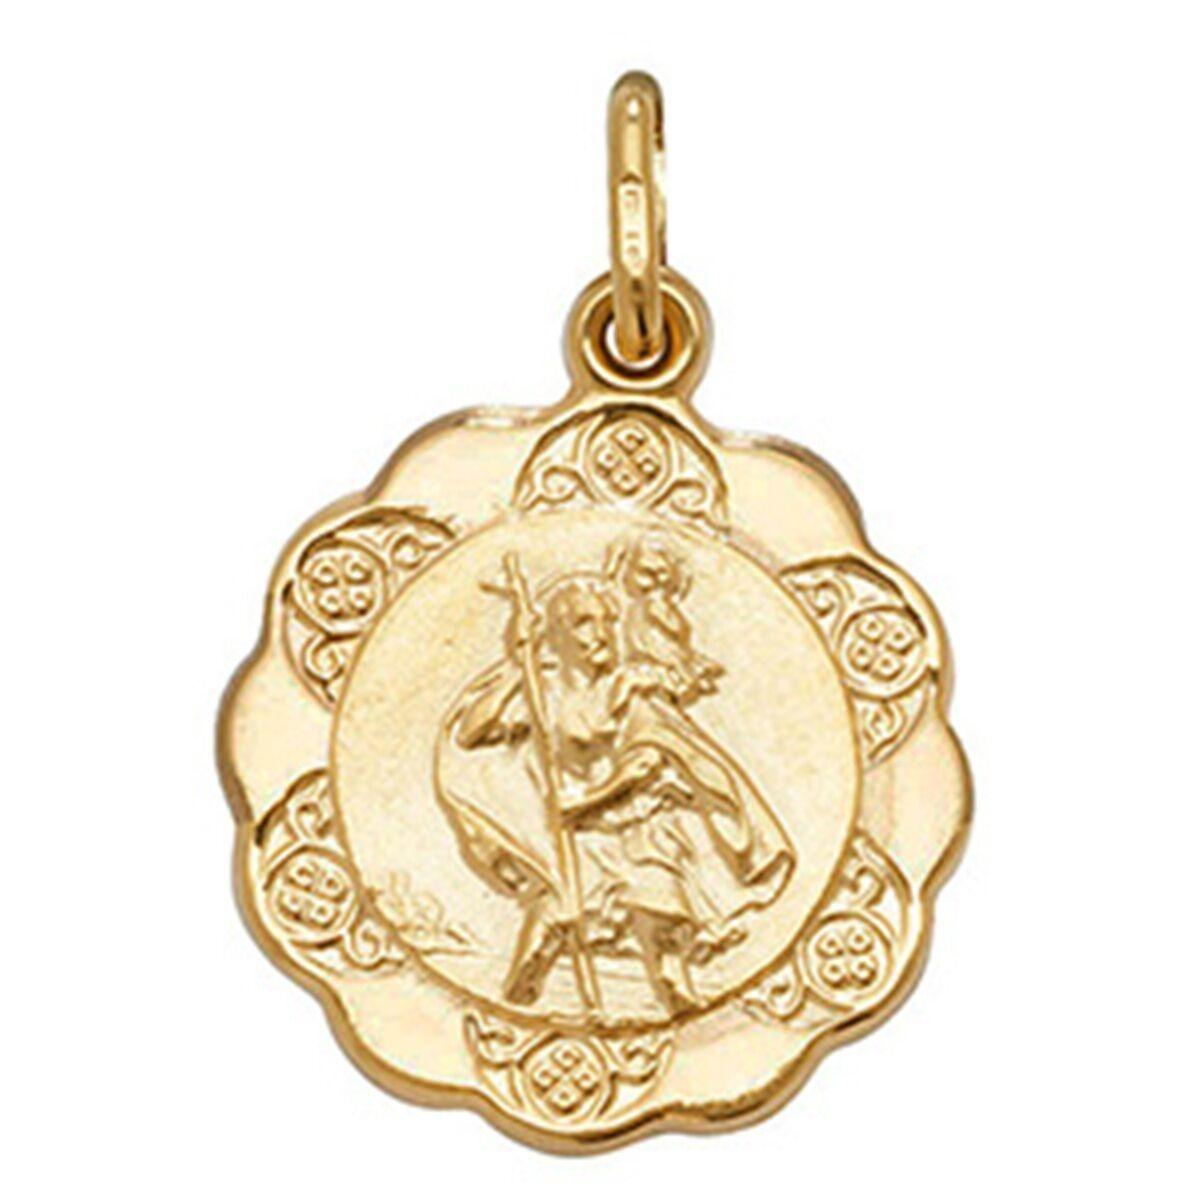 9ct gold Lightweight St Christopher Pendant 1.4g